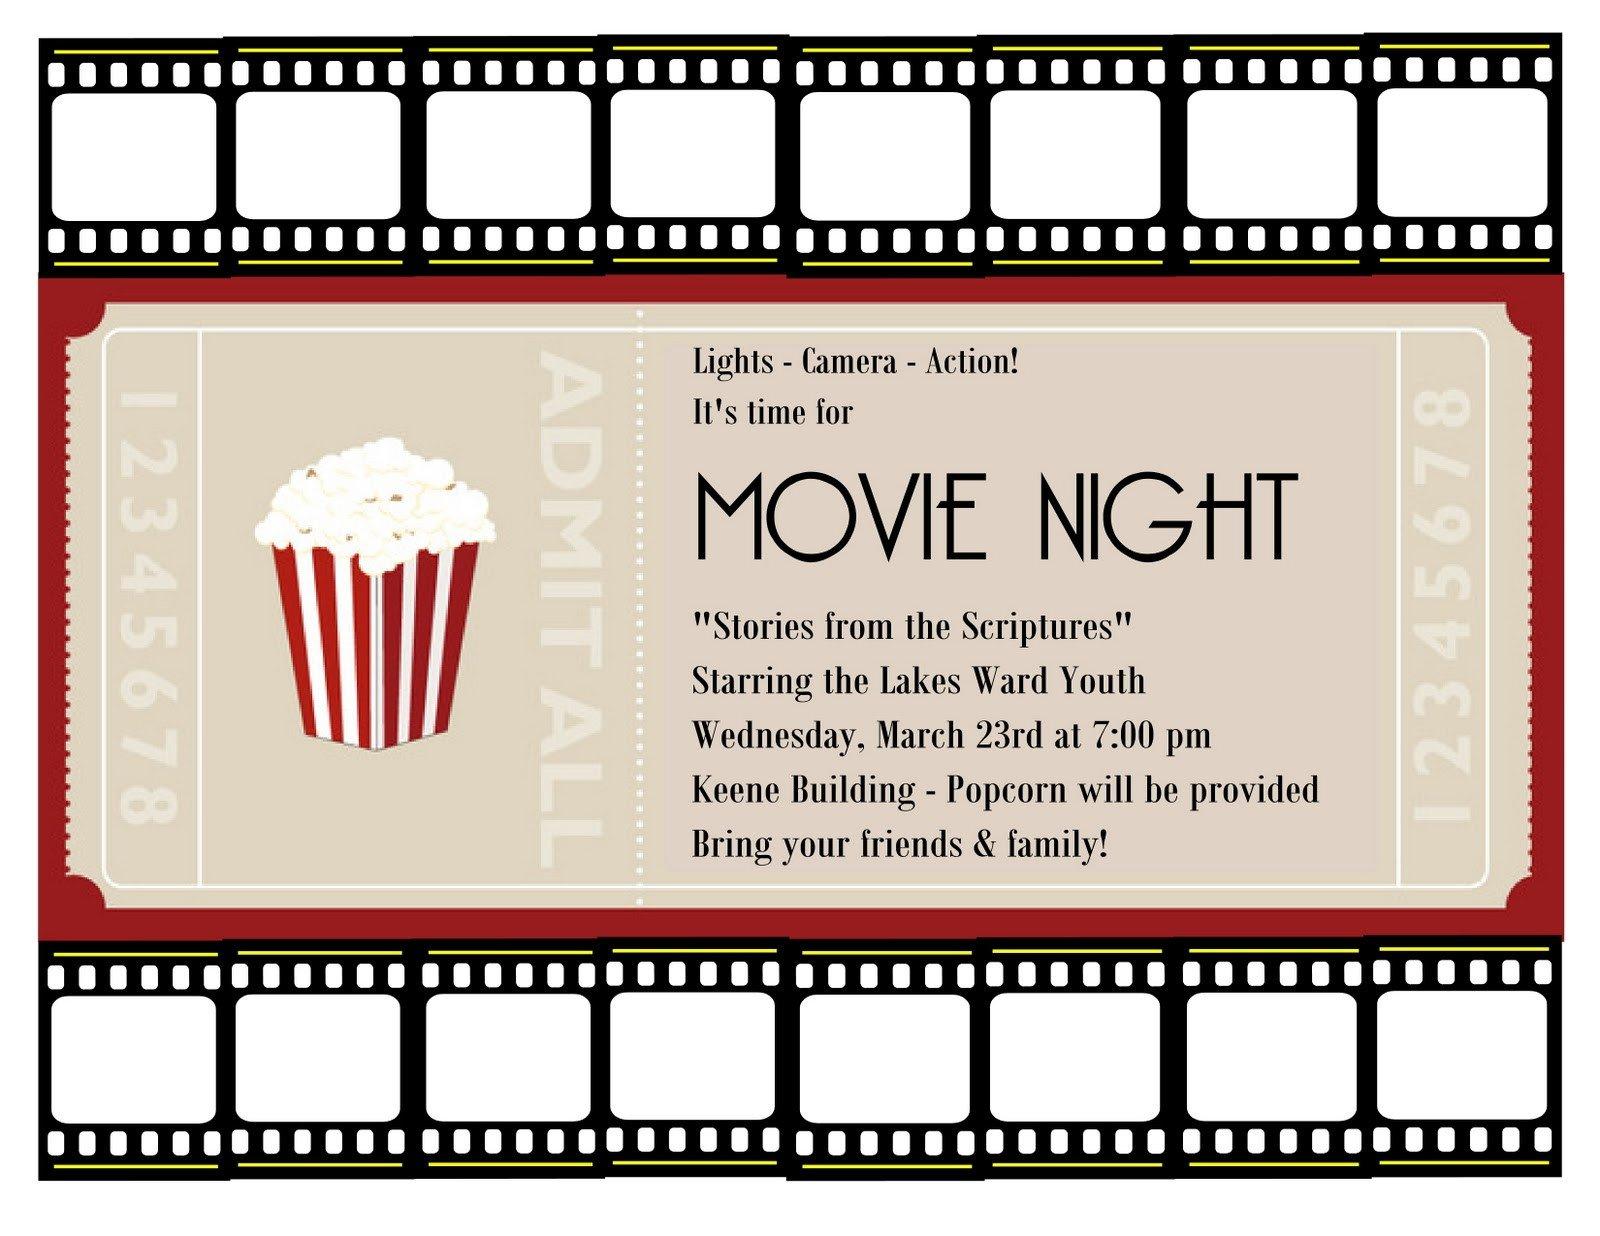 Free Movie Ticket Template Movie Ticket Template